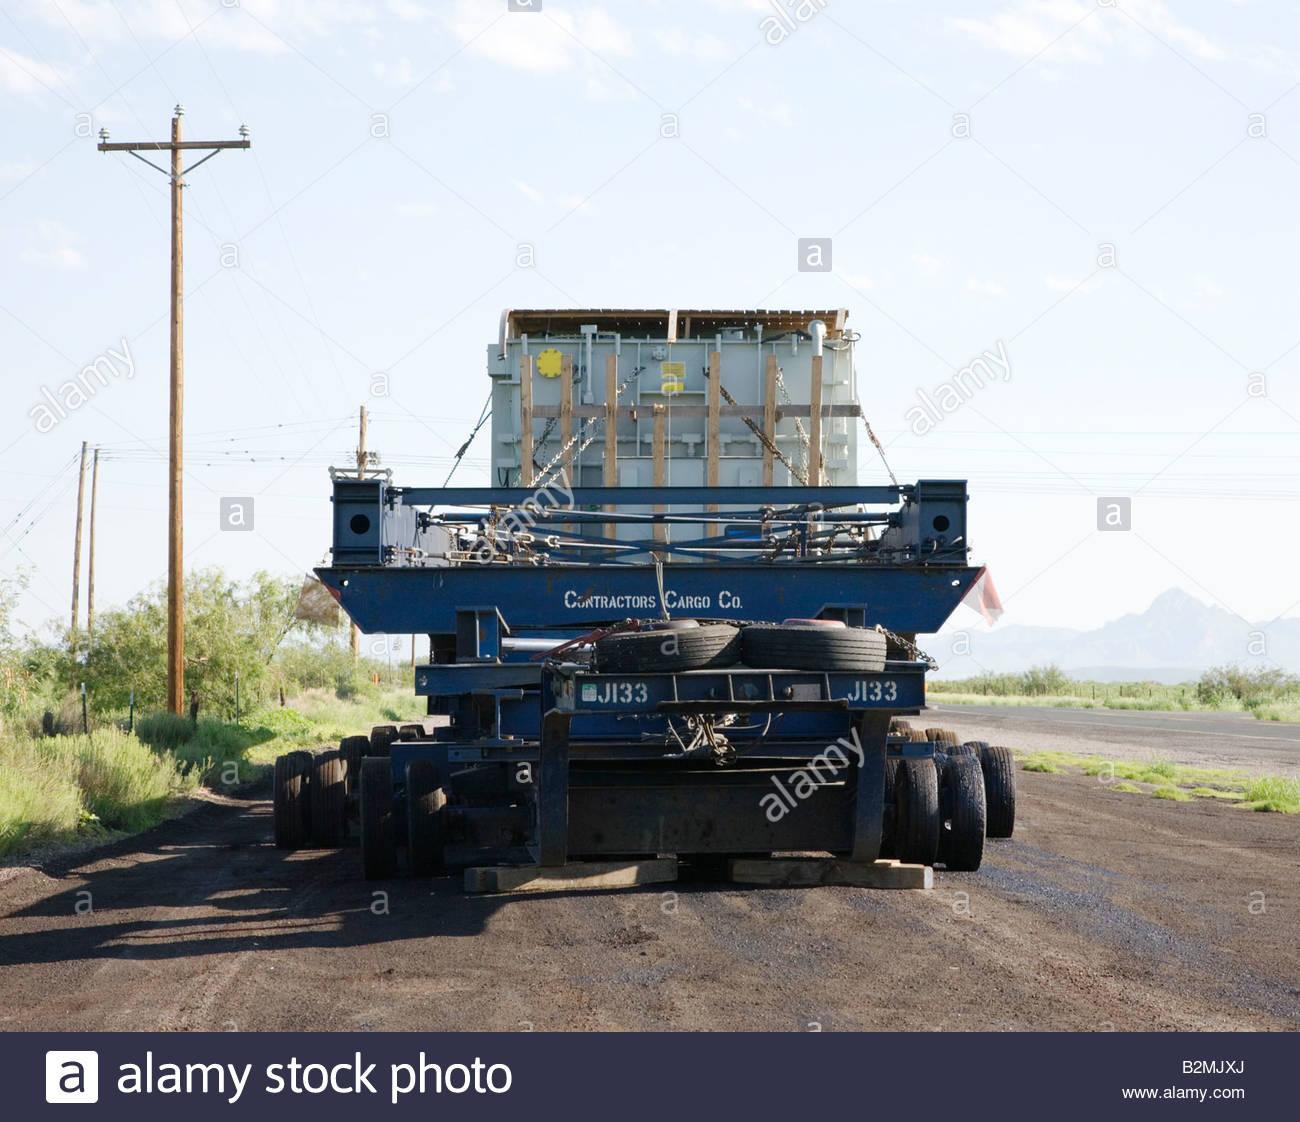 hight resolution of dual lane transporter heavy hauler 32 axles 128 tires heavy transformer hauling wide load oversize load